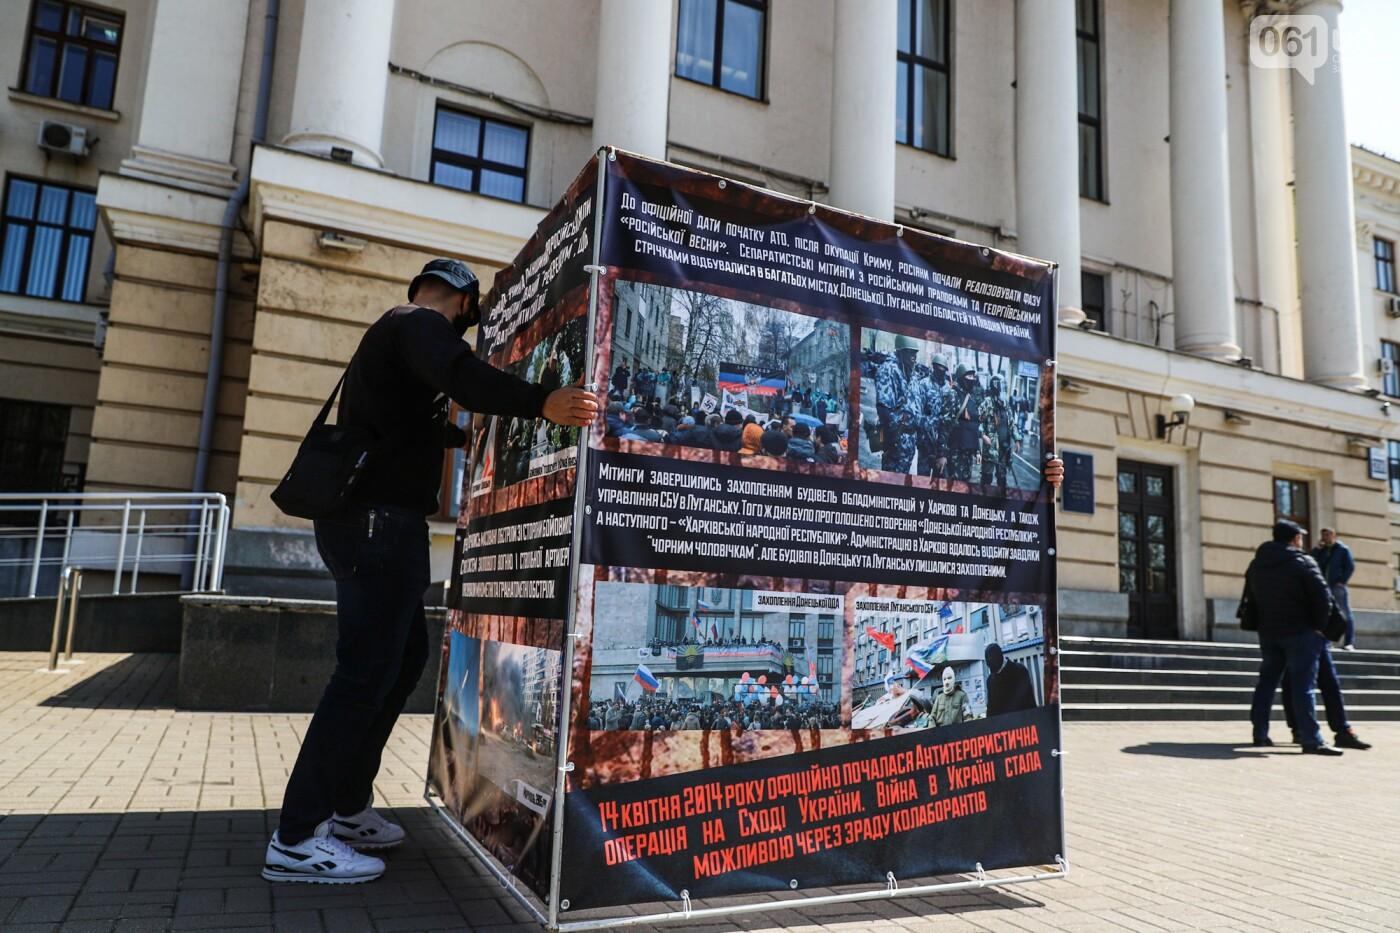 В Запорожье возле мэрии установили стенды с портретами Медведчука и Шария, - ФОТО, фото-3